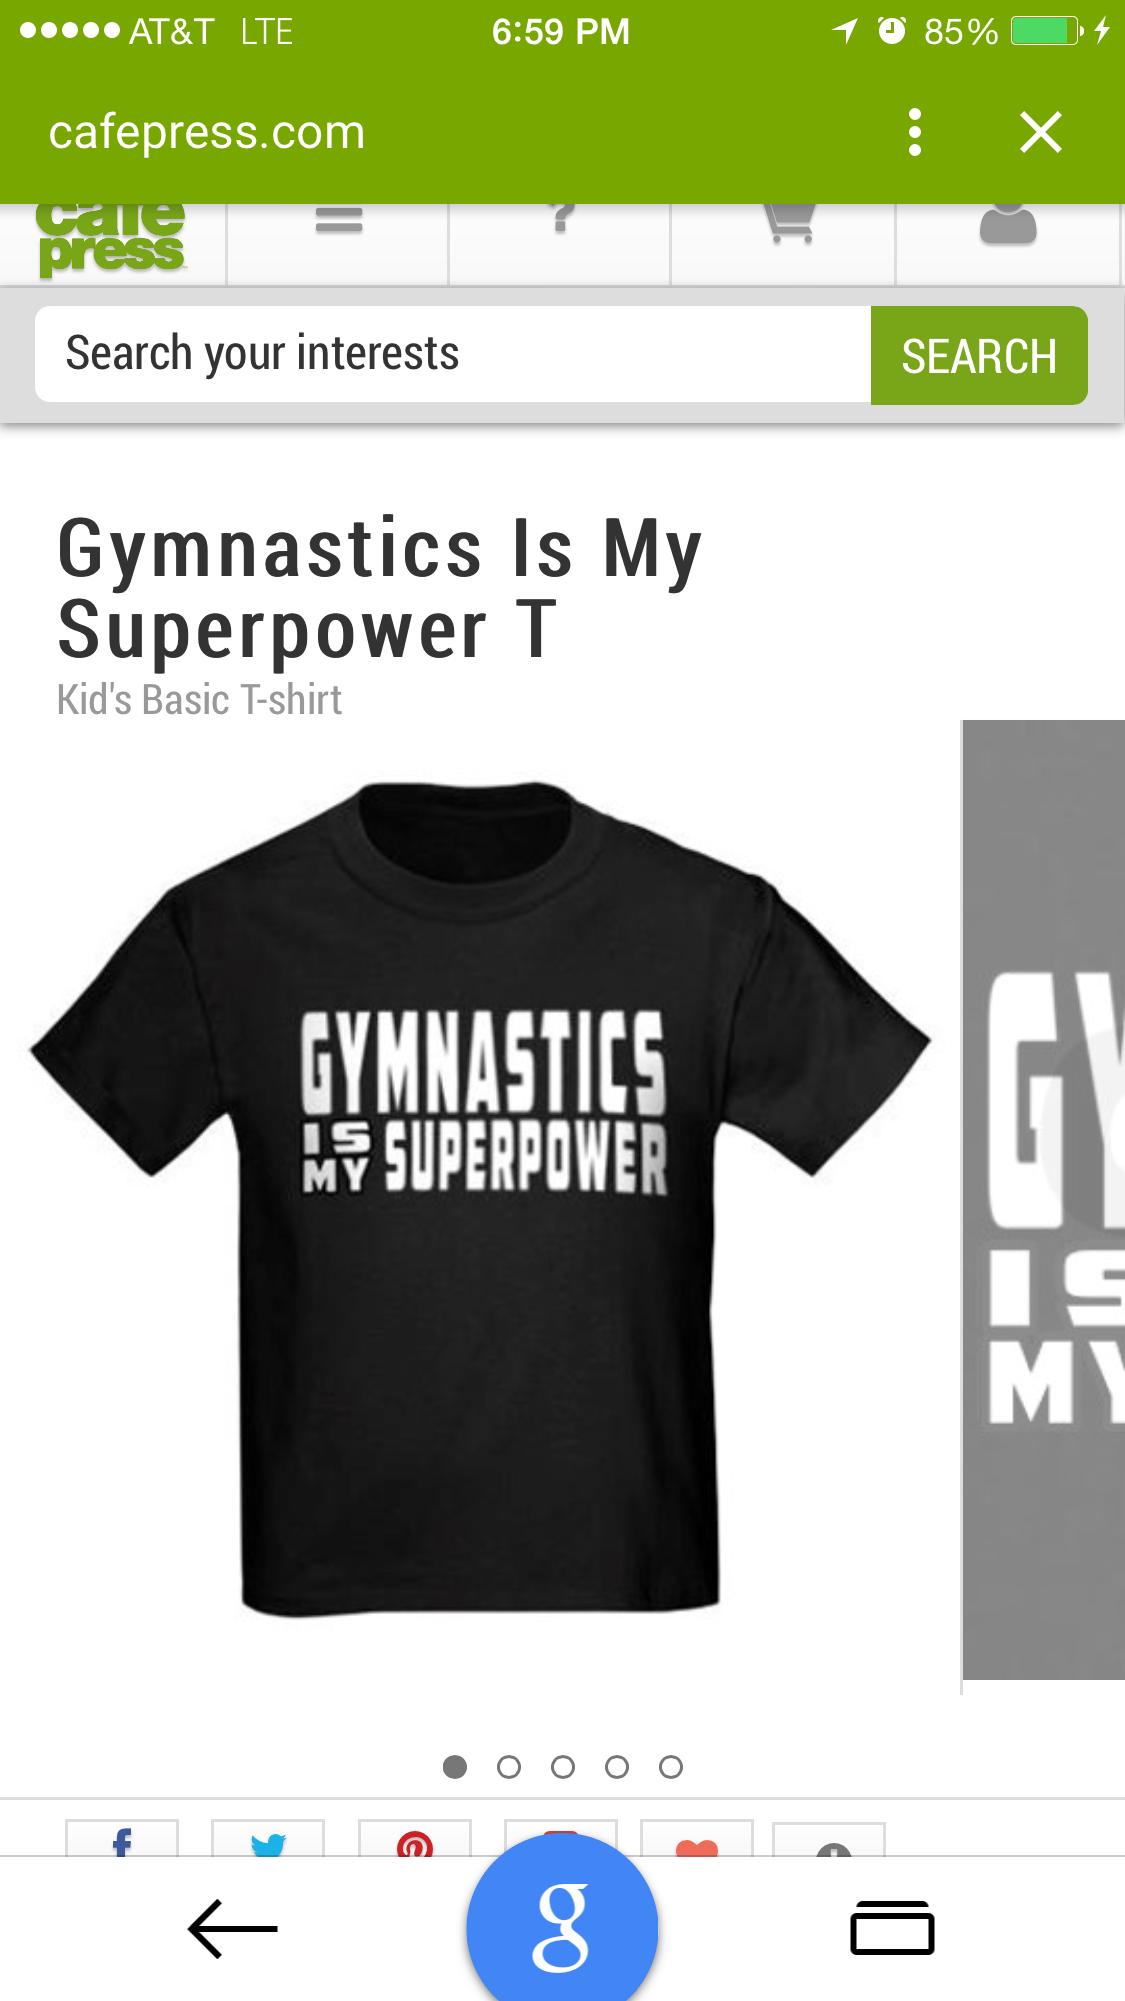 c2d2937ae819 Pin by Christina Ortiz on Gymnastics | Mens tops, Men, Tops